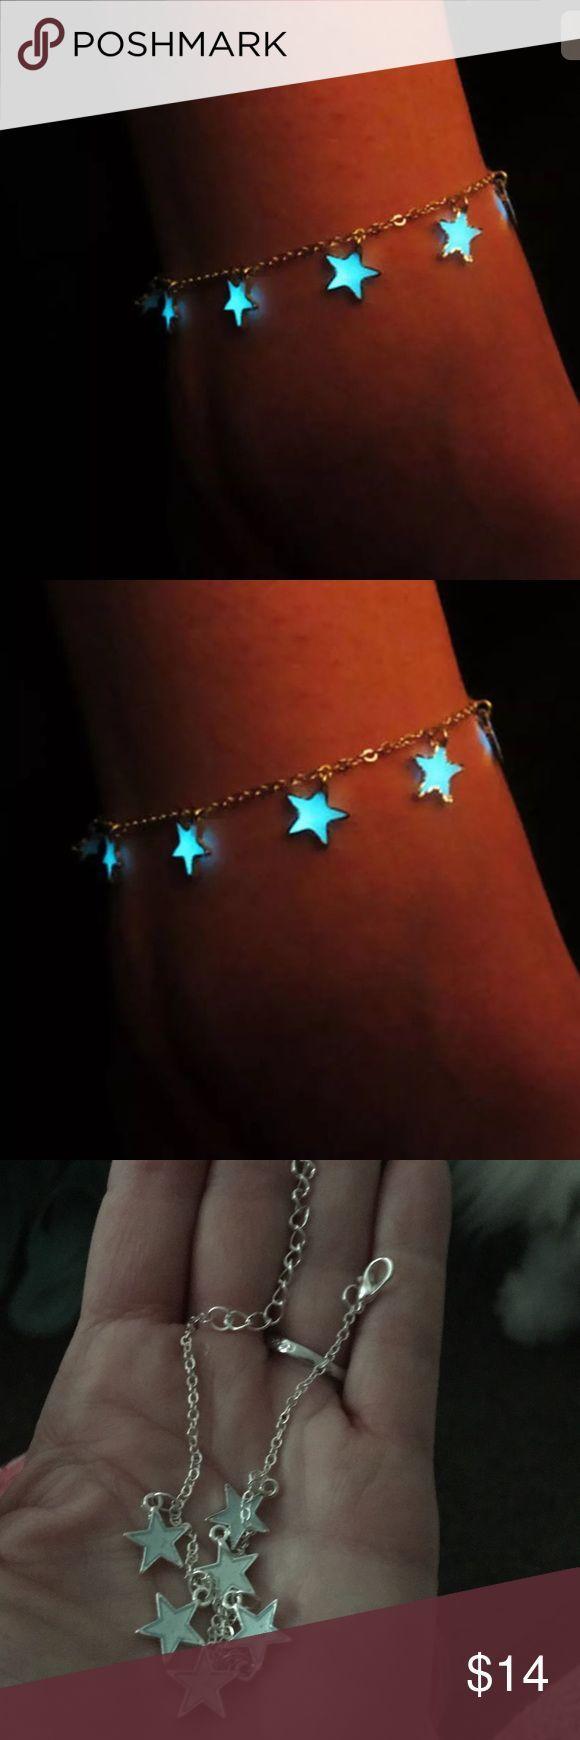 Glow In The Dark Sta Star Silver Anklet Nwt Jewelry